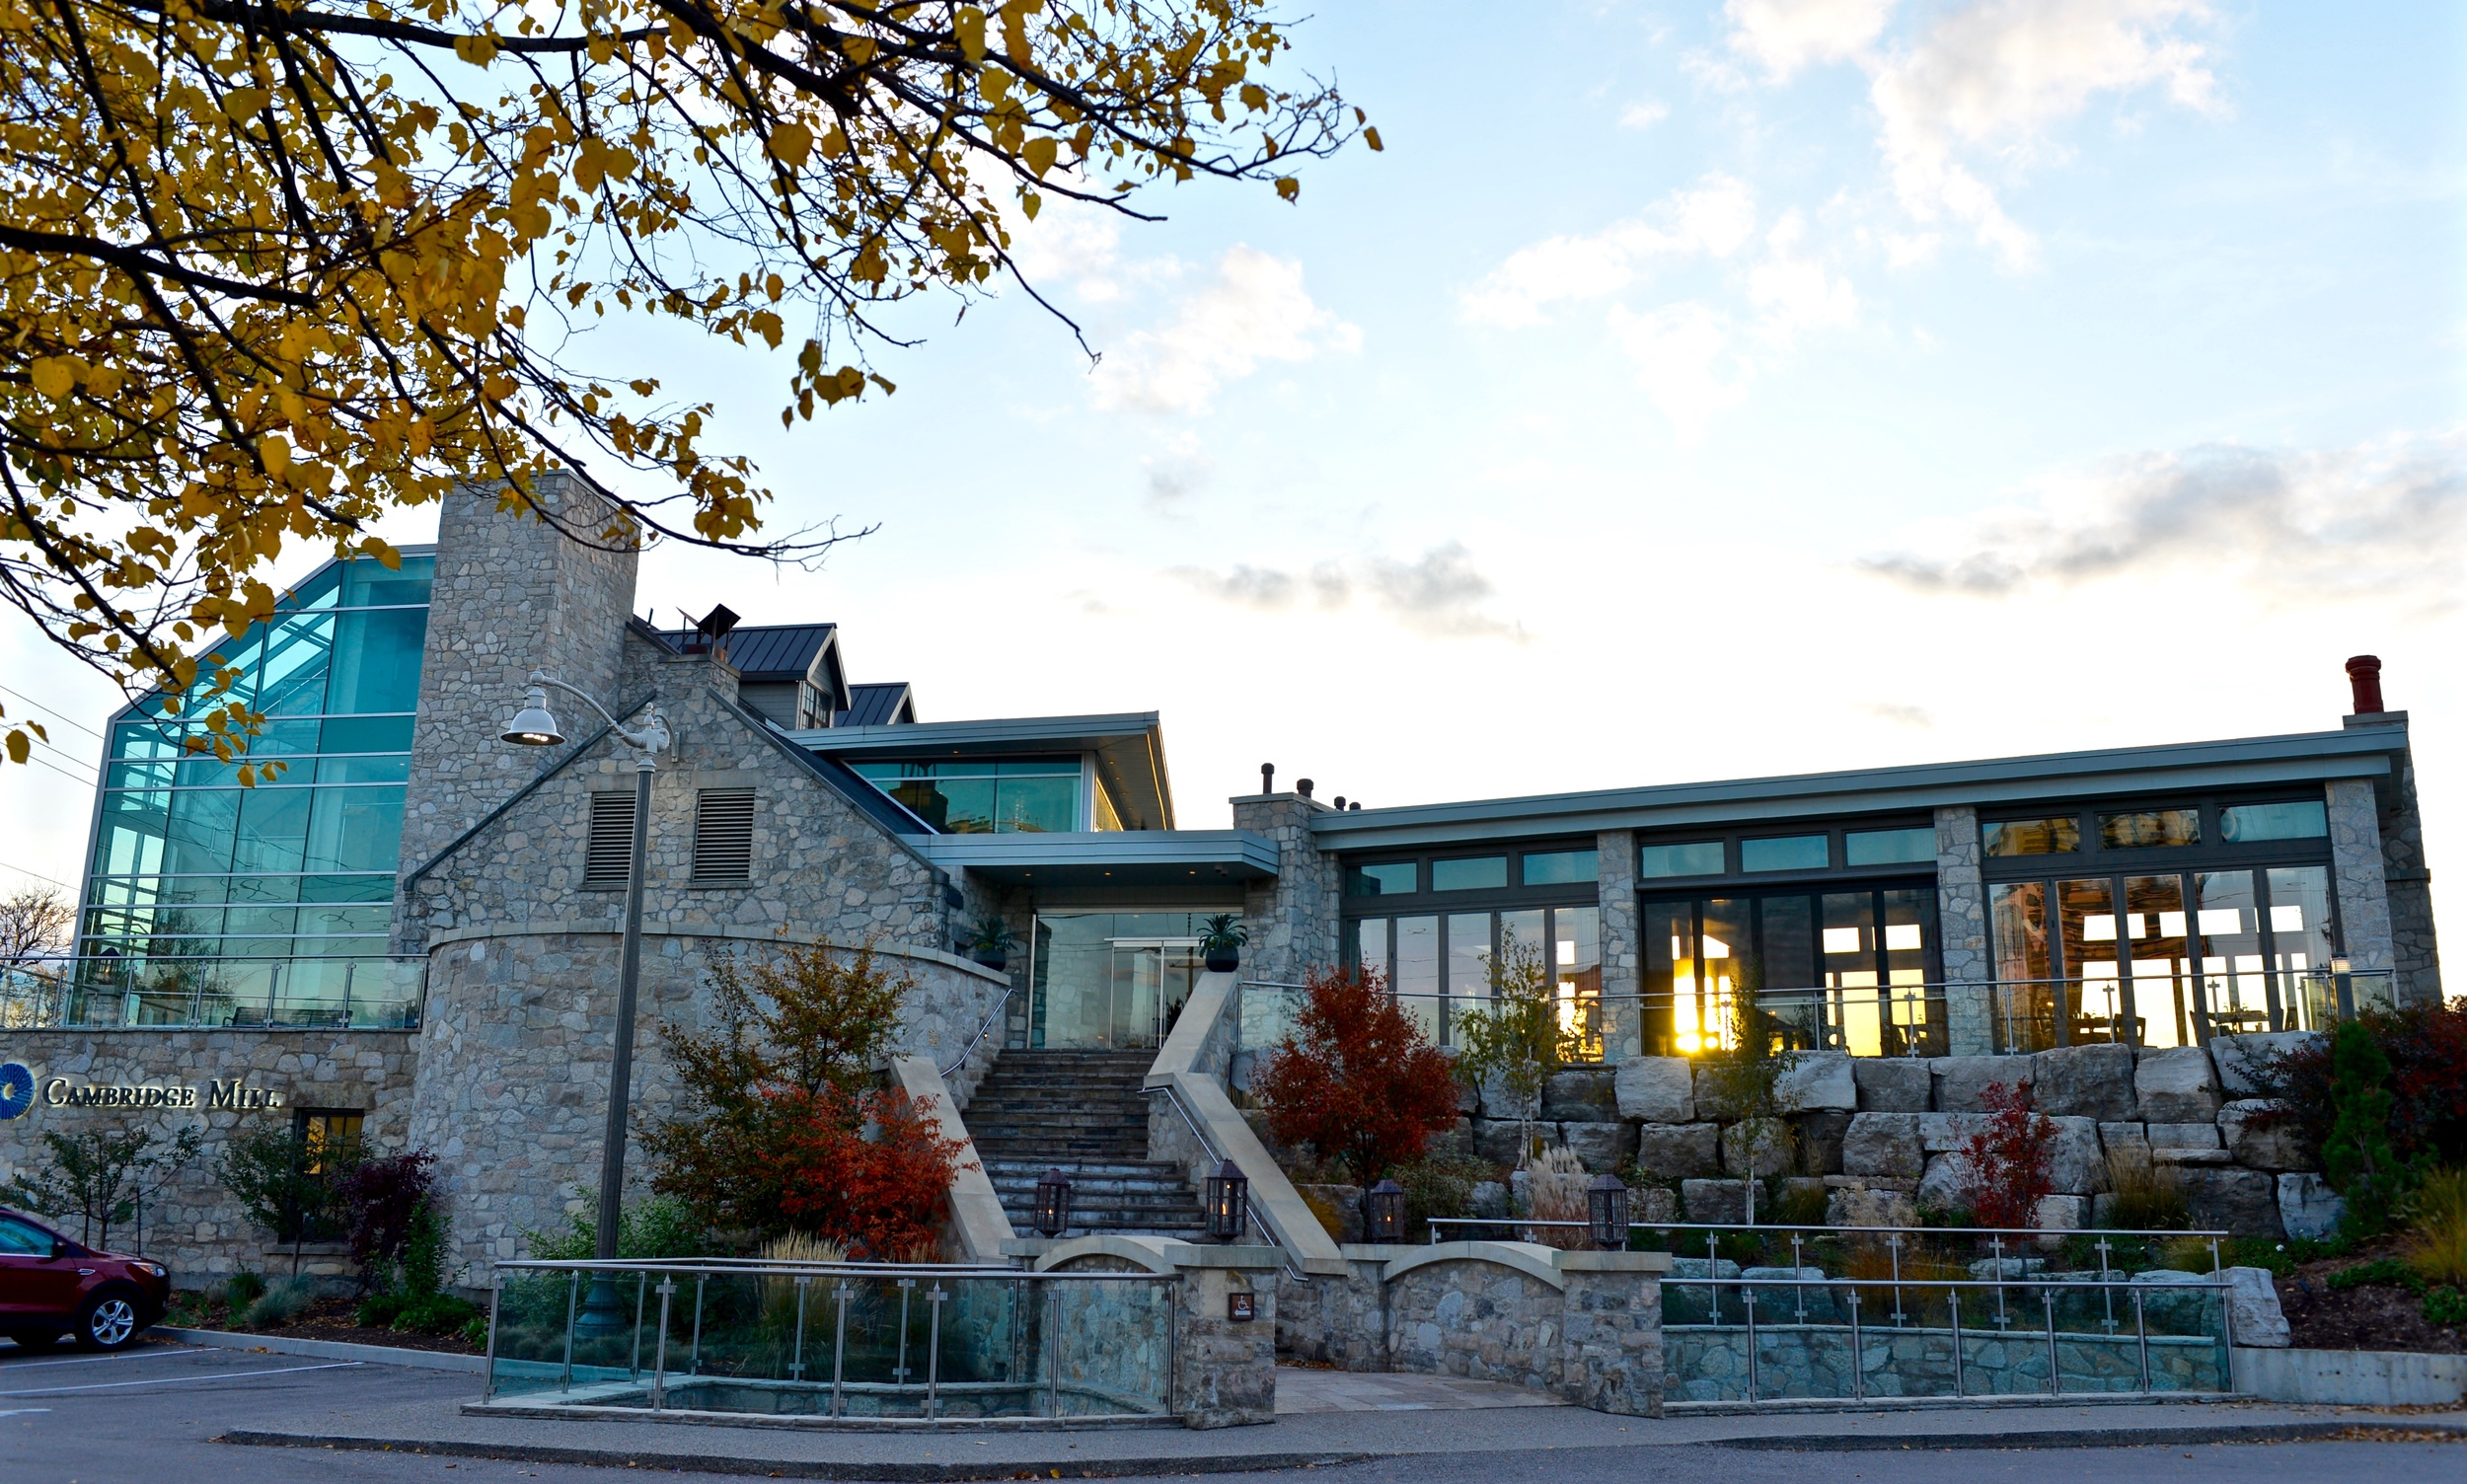 The Cambridge Mill Restaurant